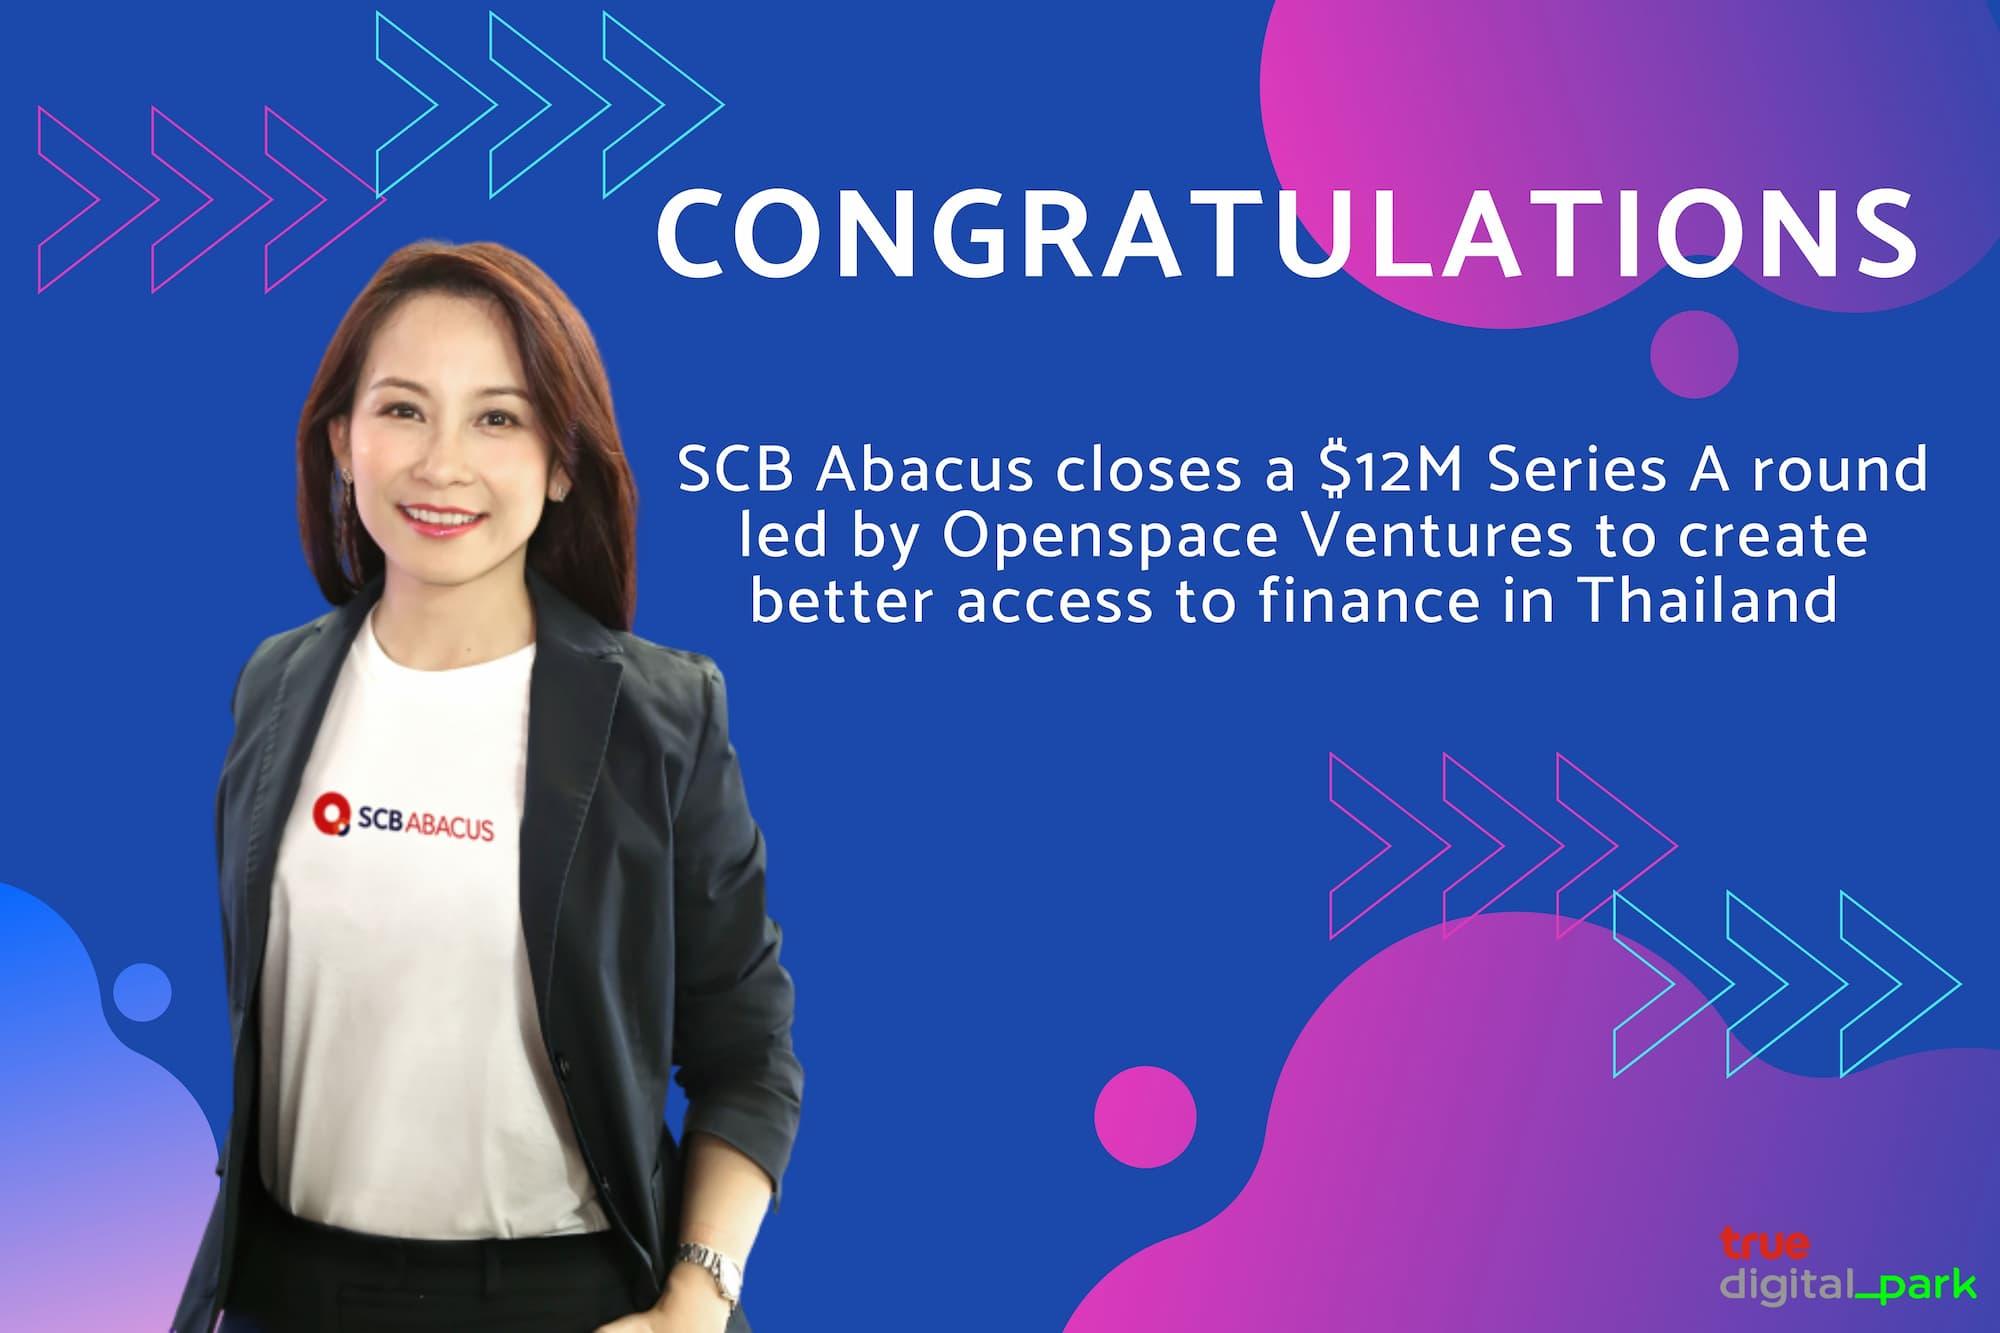 SCB Abacus คว้าเงินลงทุนต่างชาติ 400 ล้านบาท ในการระดมเงินทุนรอบ Series A จาก Openspace Ventures